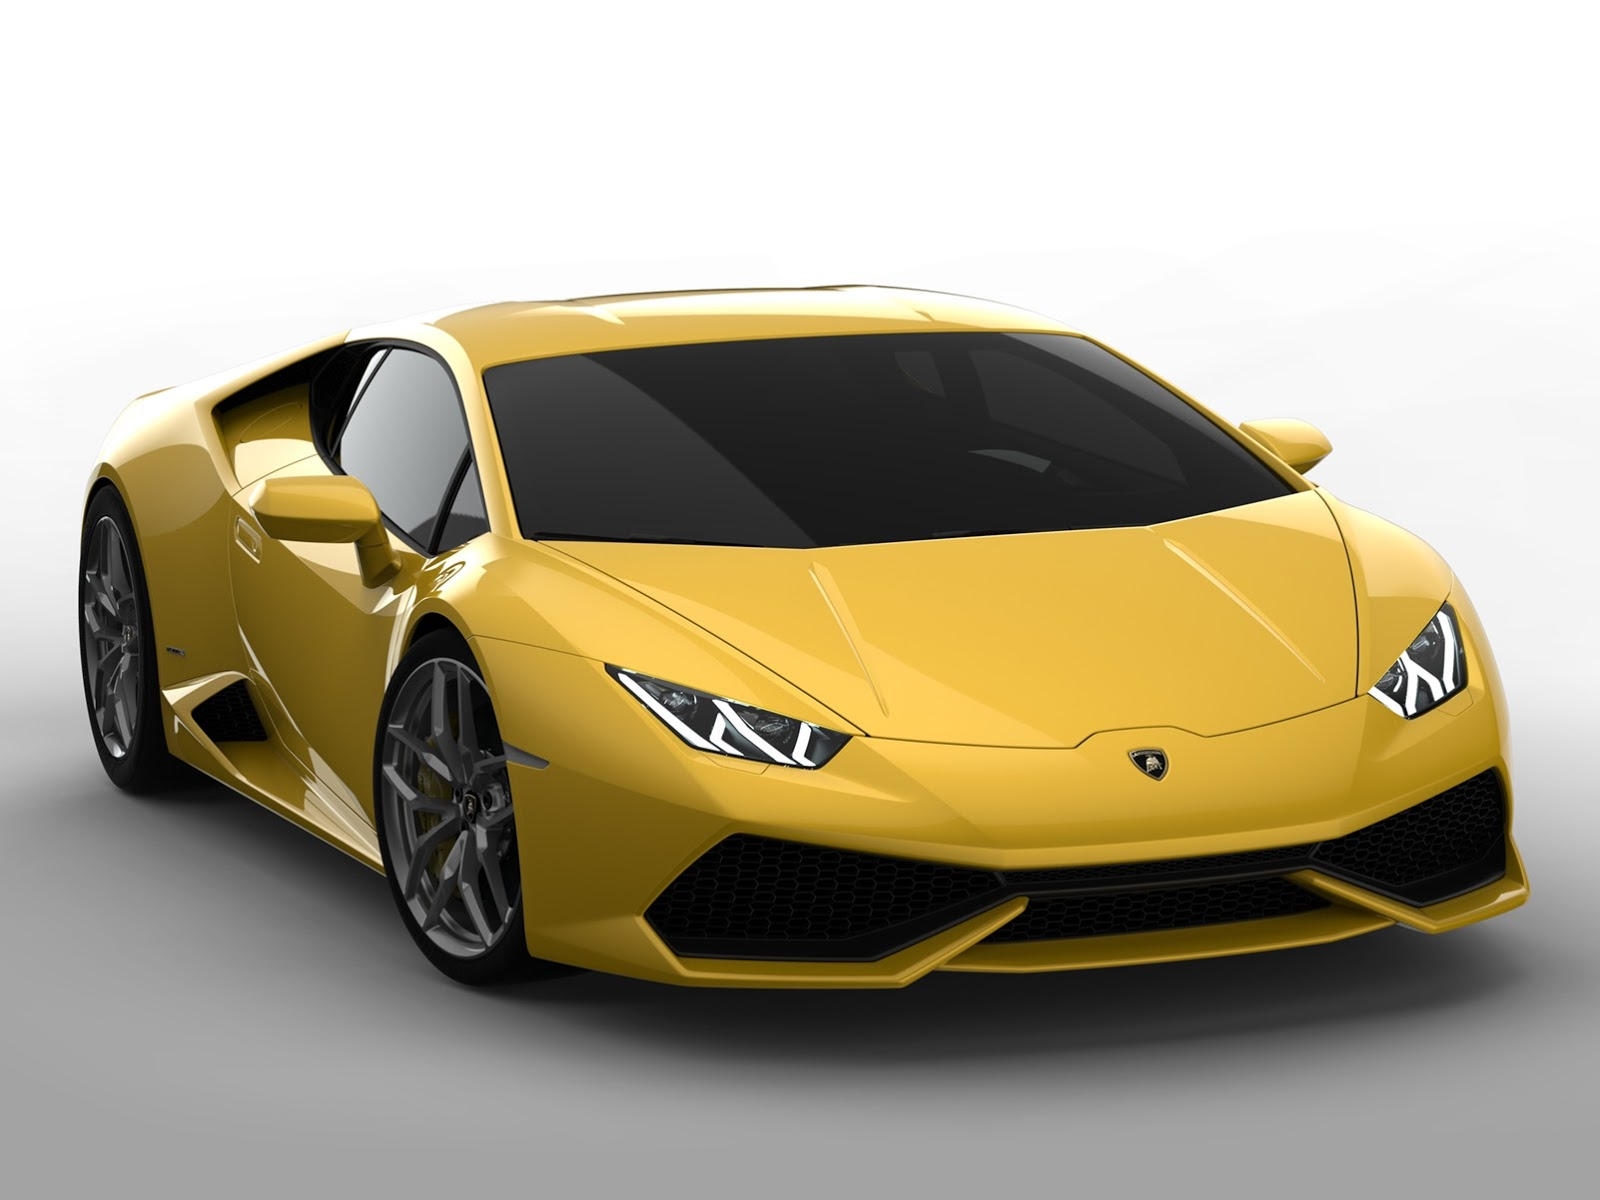 New-Lamborghini-Huracan-LP-610-4-pics (4)